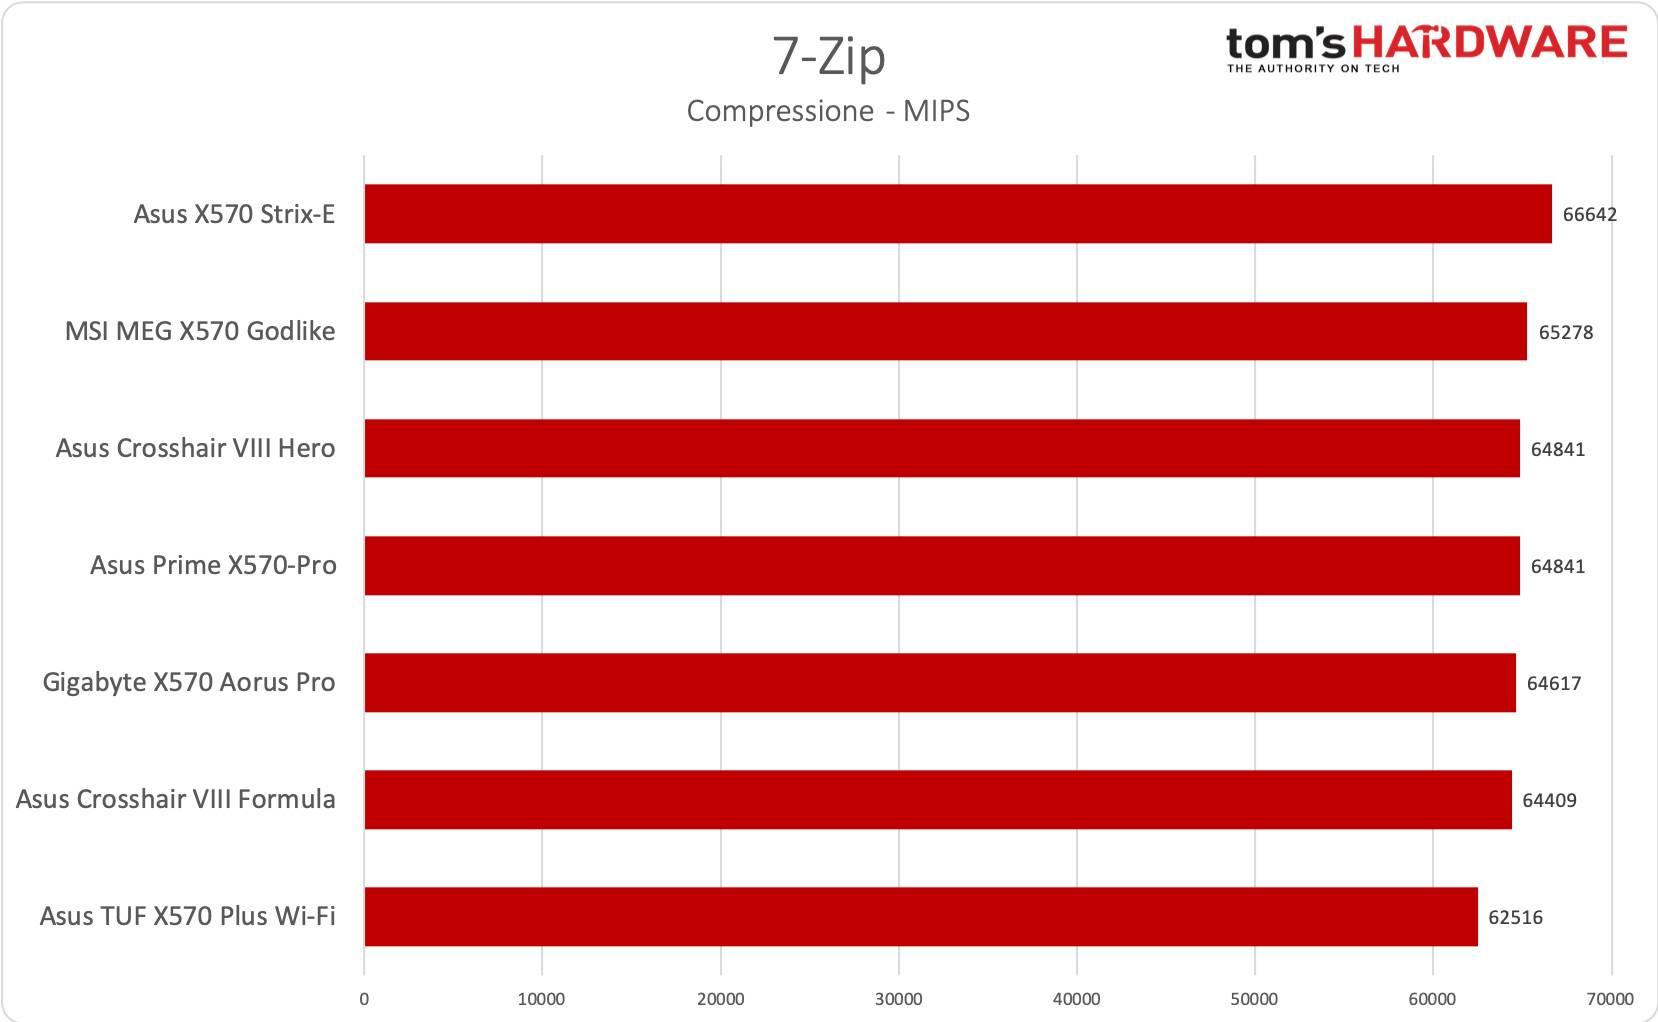 Asus TUF Gaming X570-Plus Wi-Fi - 7zip compressione